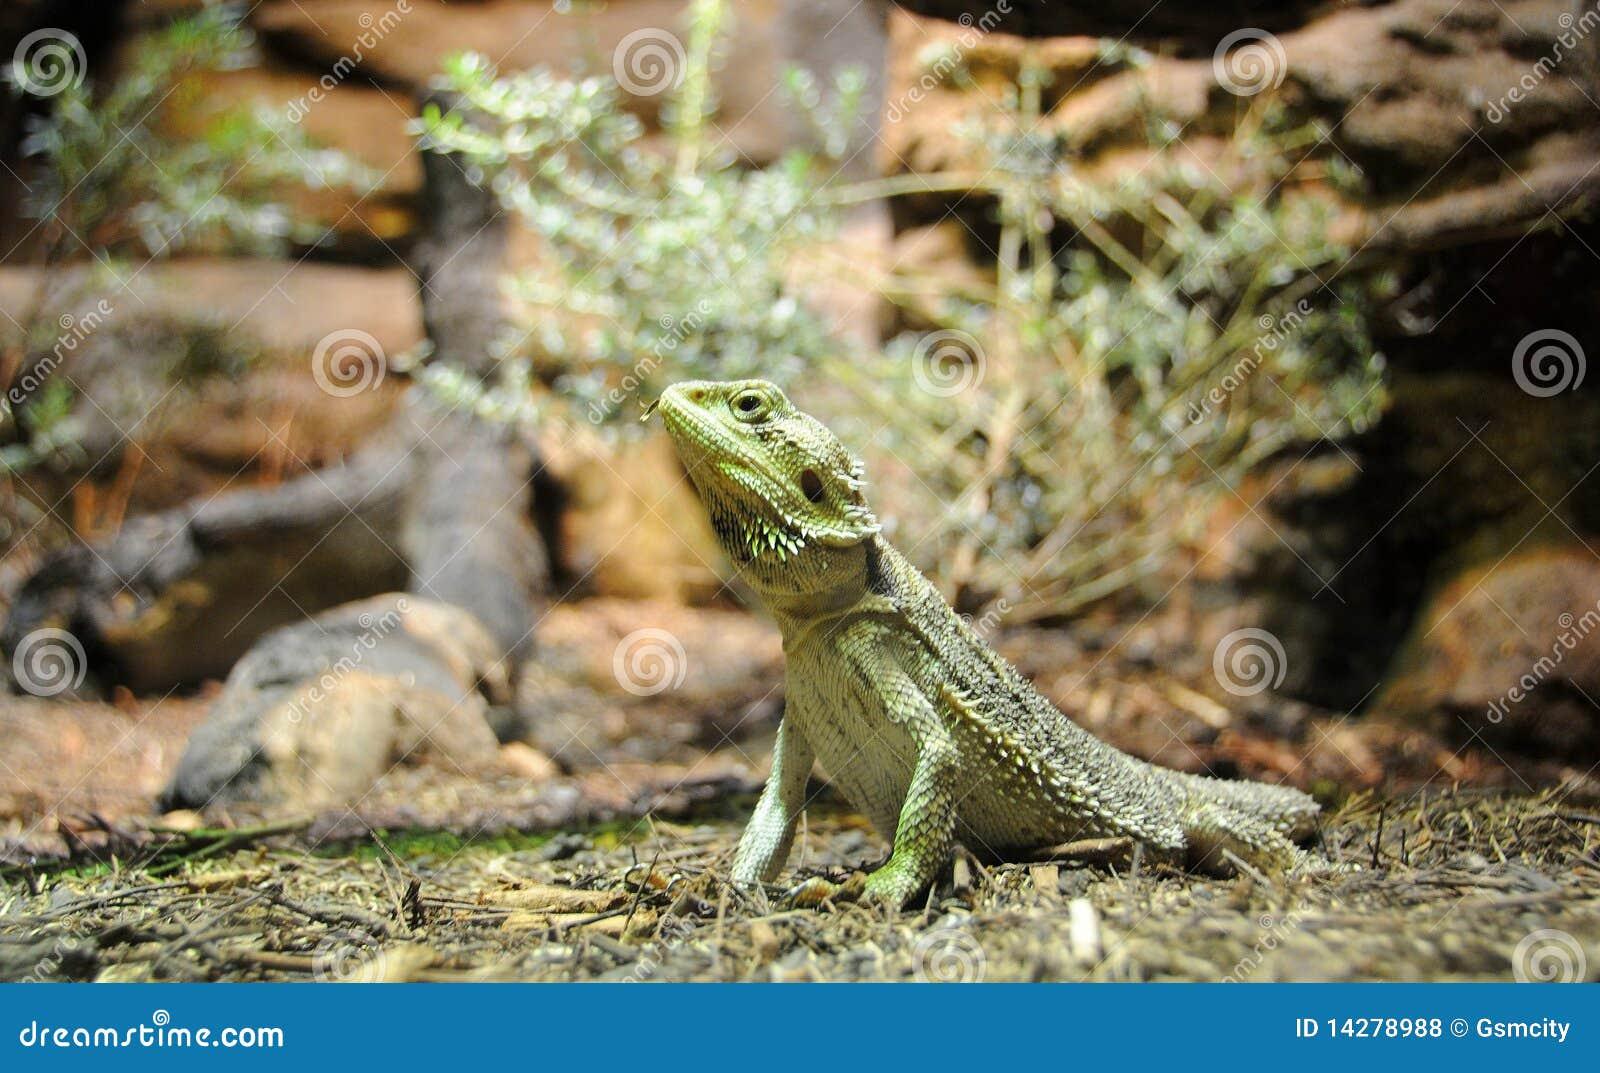 Green bearded dragons - photo#17